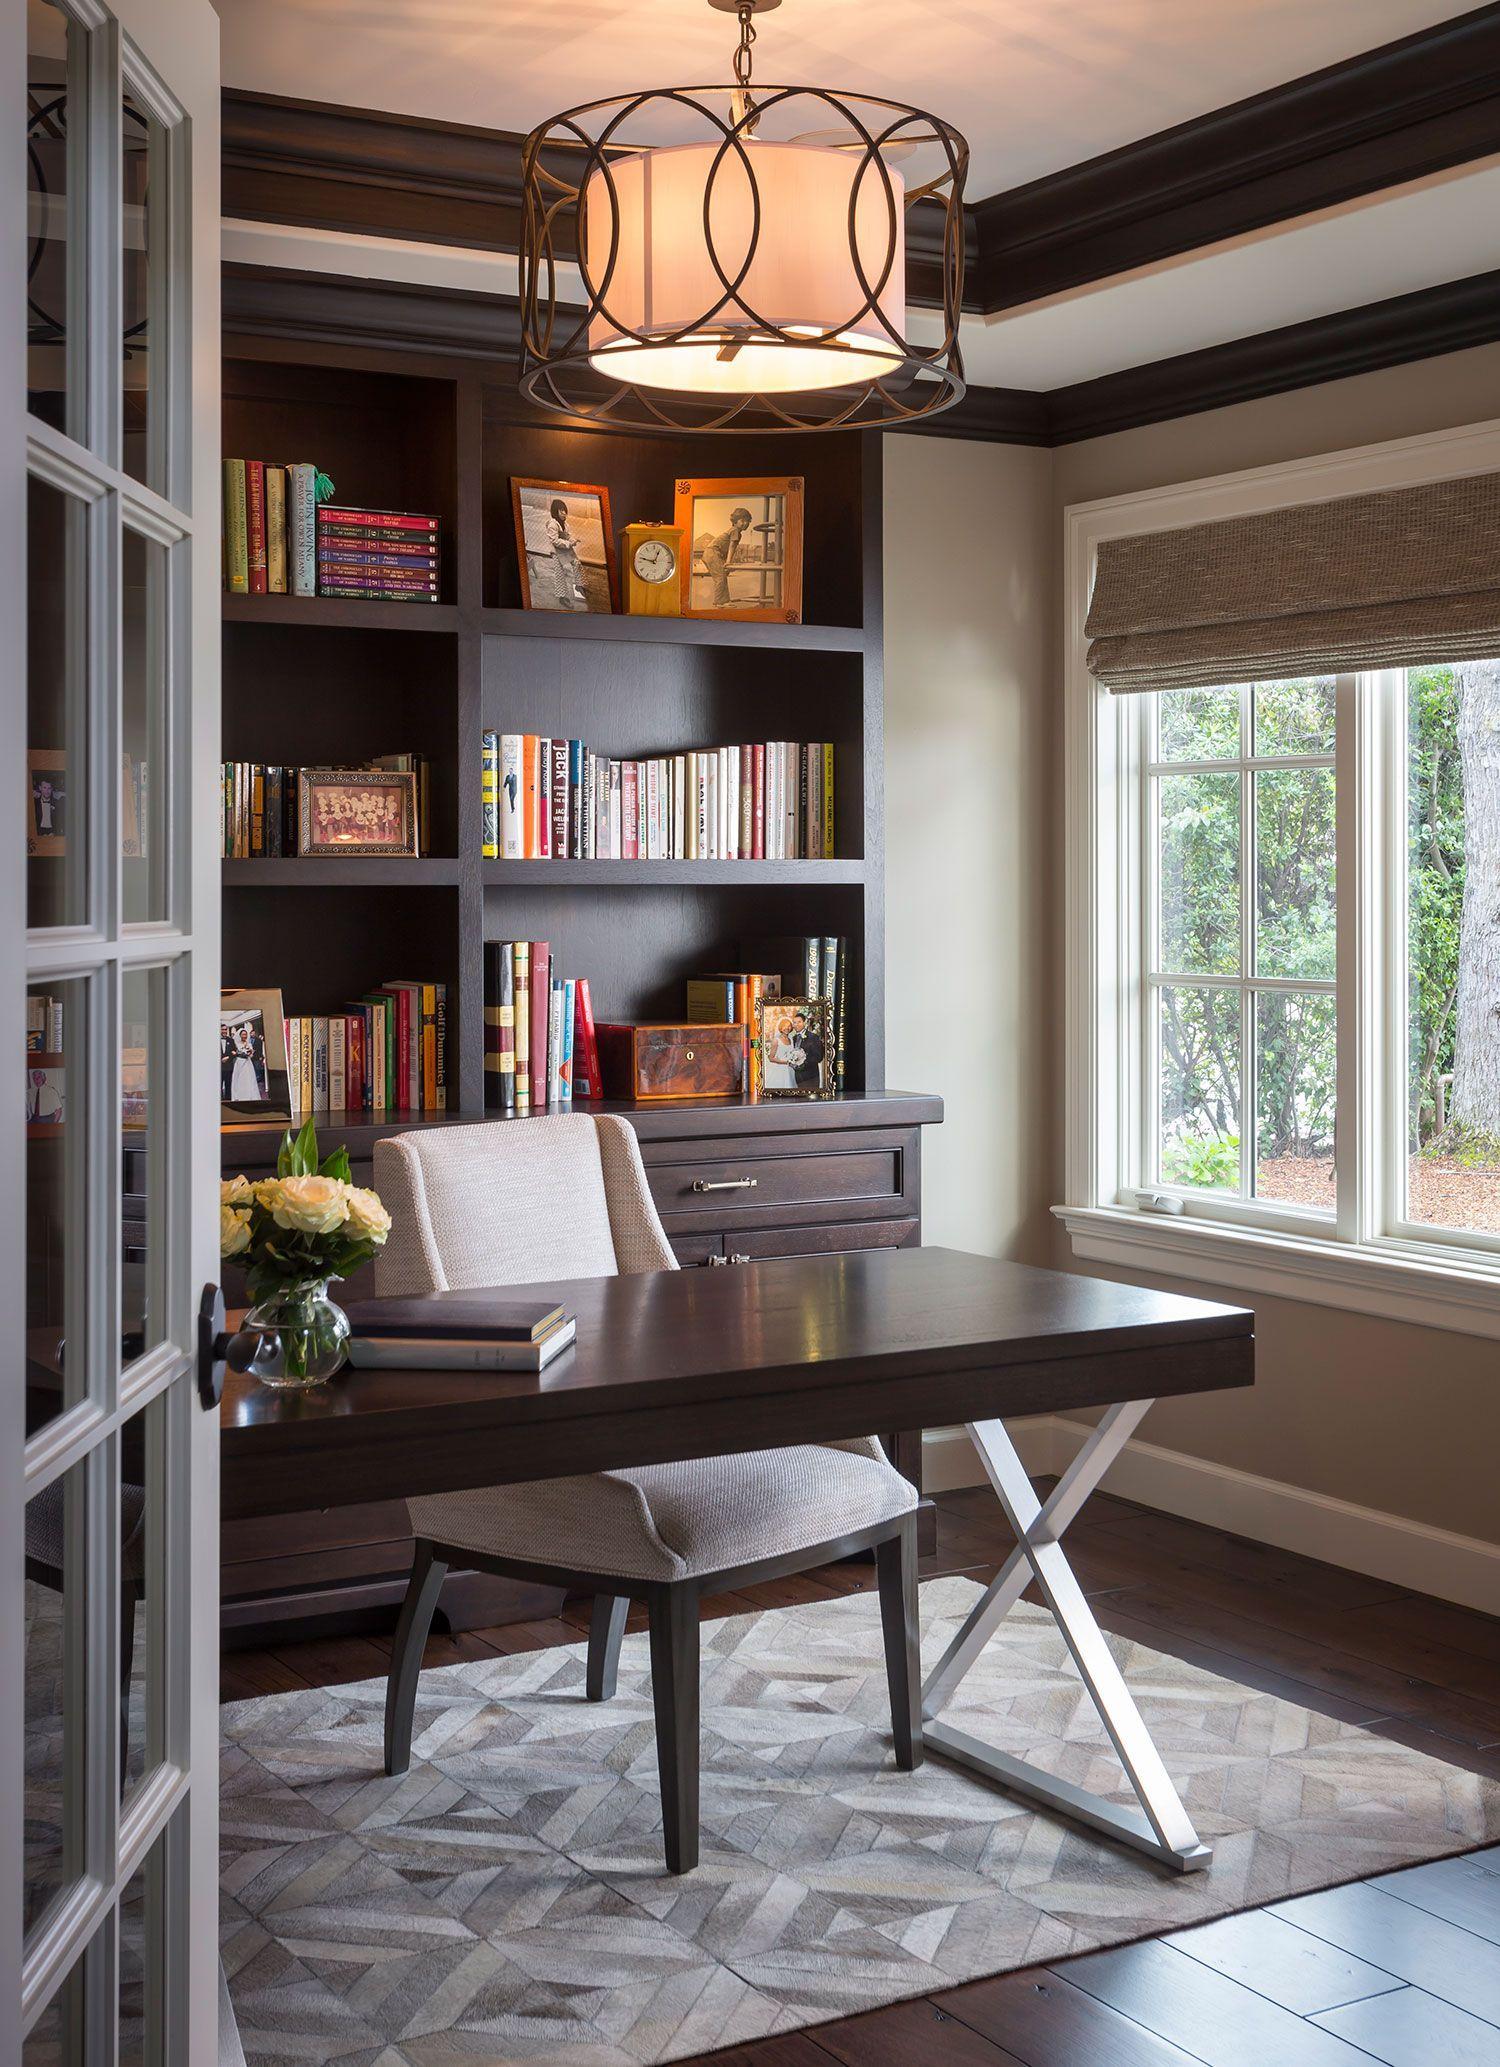 Crisp Transitional | Brownhouse Design #RaindropEssentialOilsMassage #modernlightingdesign